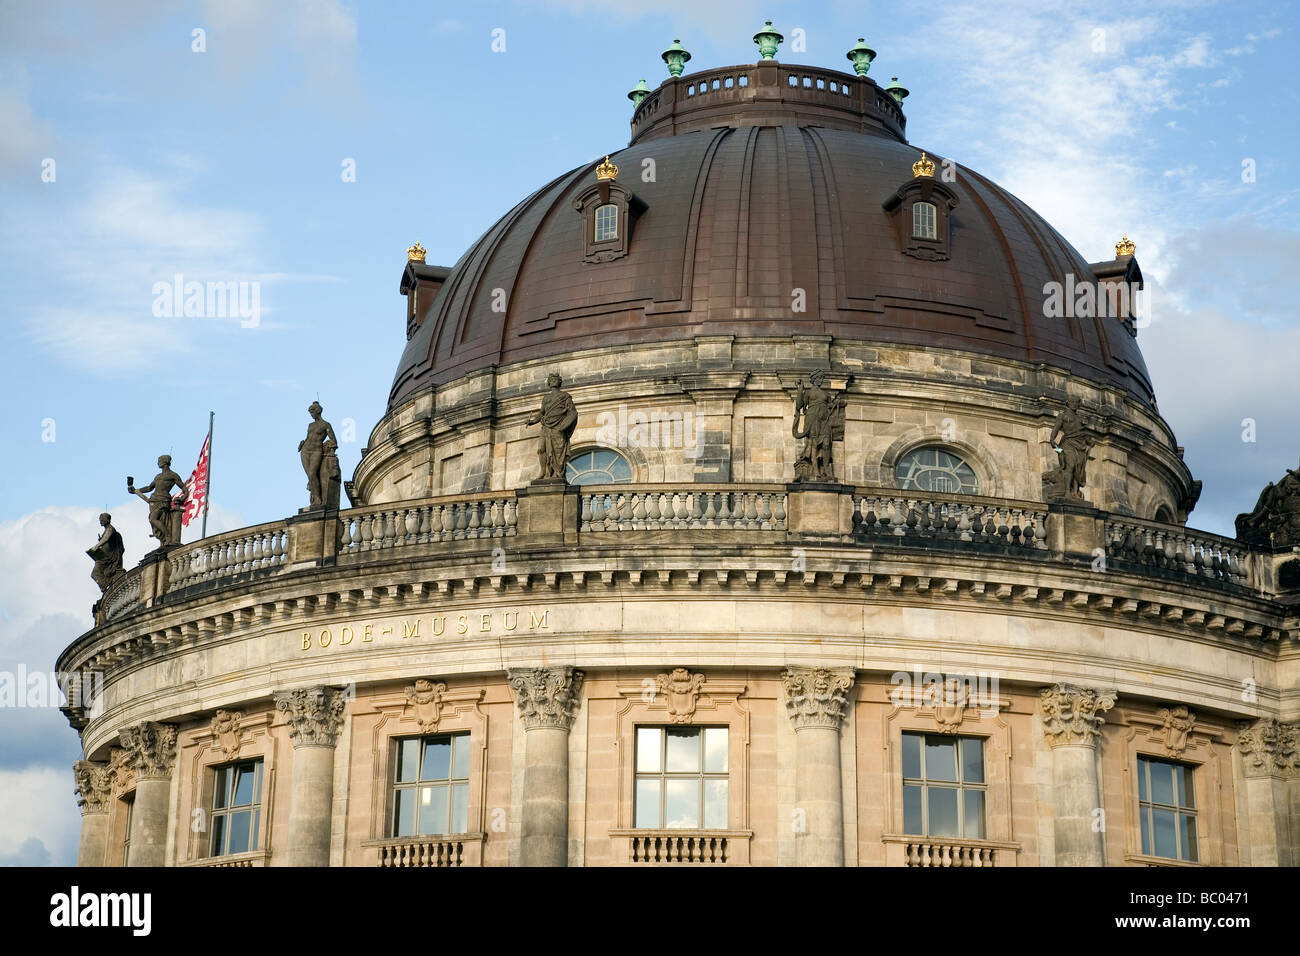 Bode Museum, Berlin, Germany - Stock Image